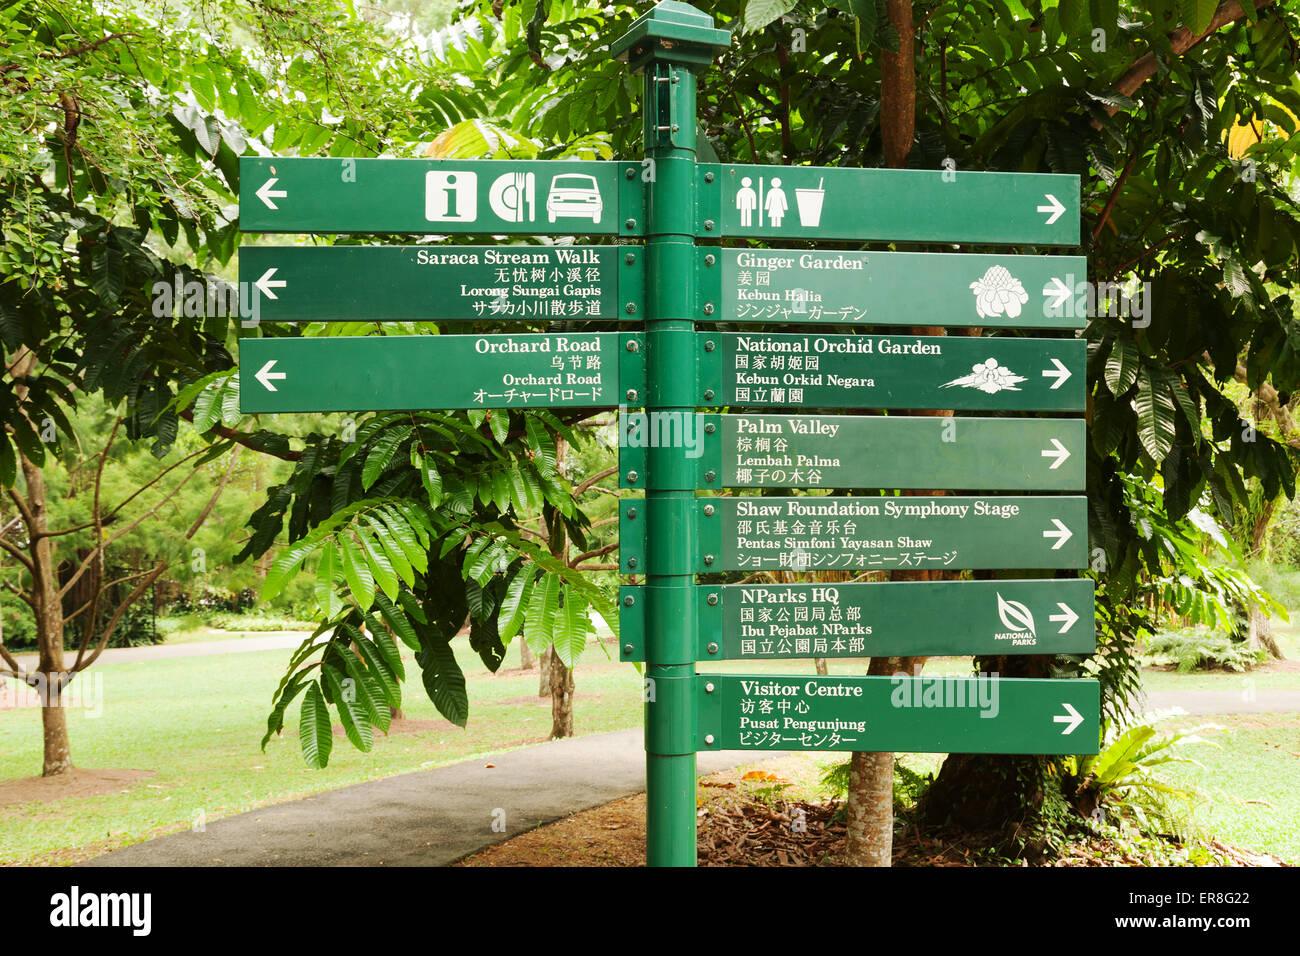 Direction Sign, Singapore Botanic Gardens, Singapore, South East Asia